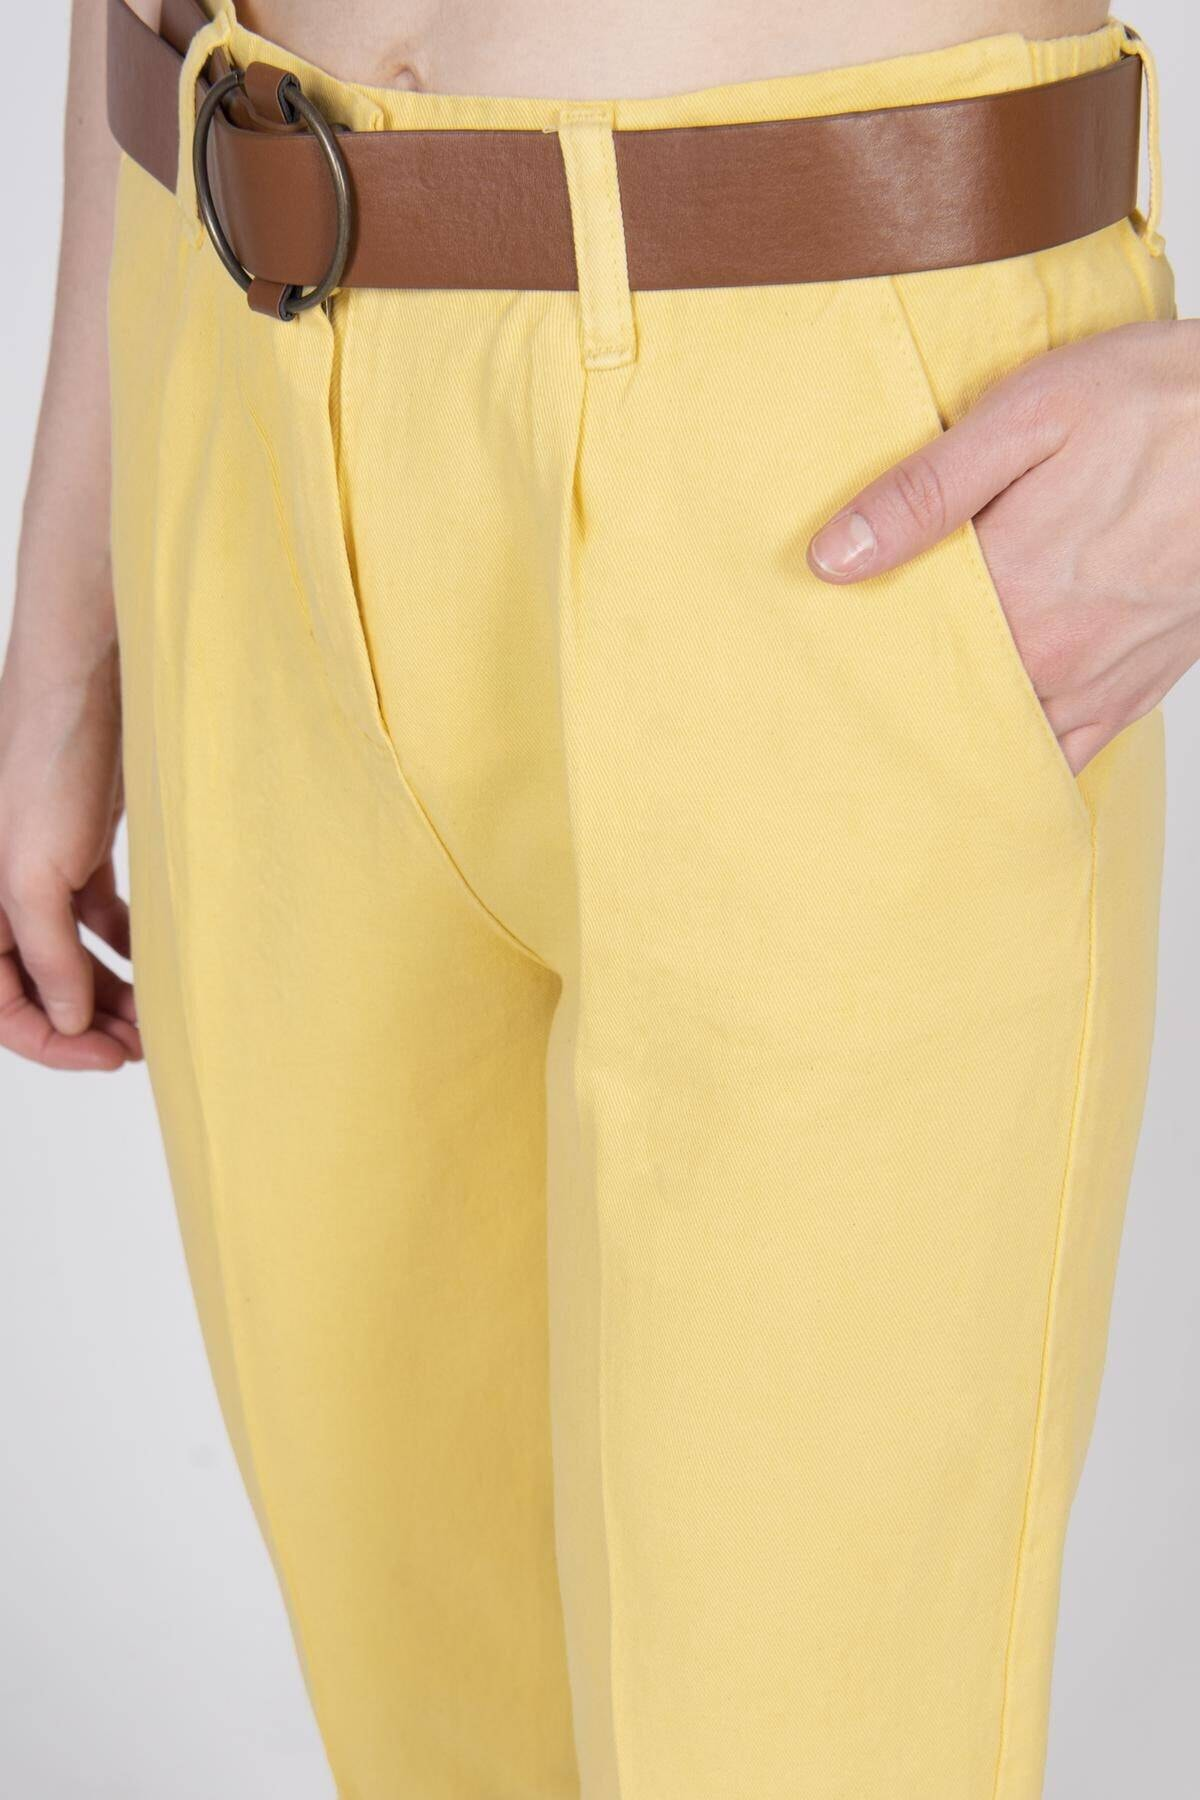 Addax Kadın Sarı Kemerli Pantolon PN4204 - T3 ADX-0000020952 2